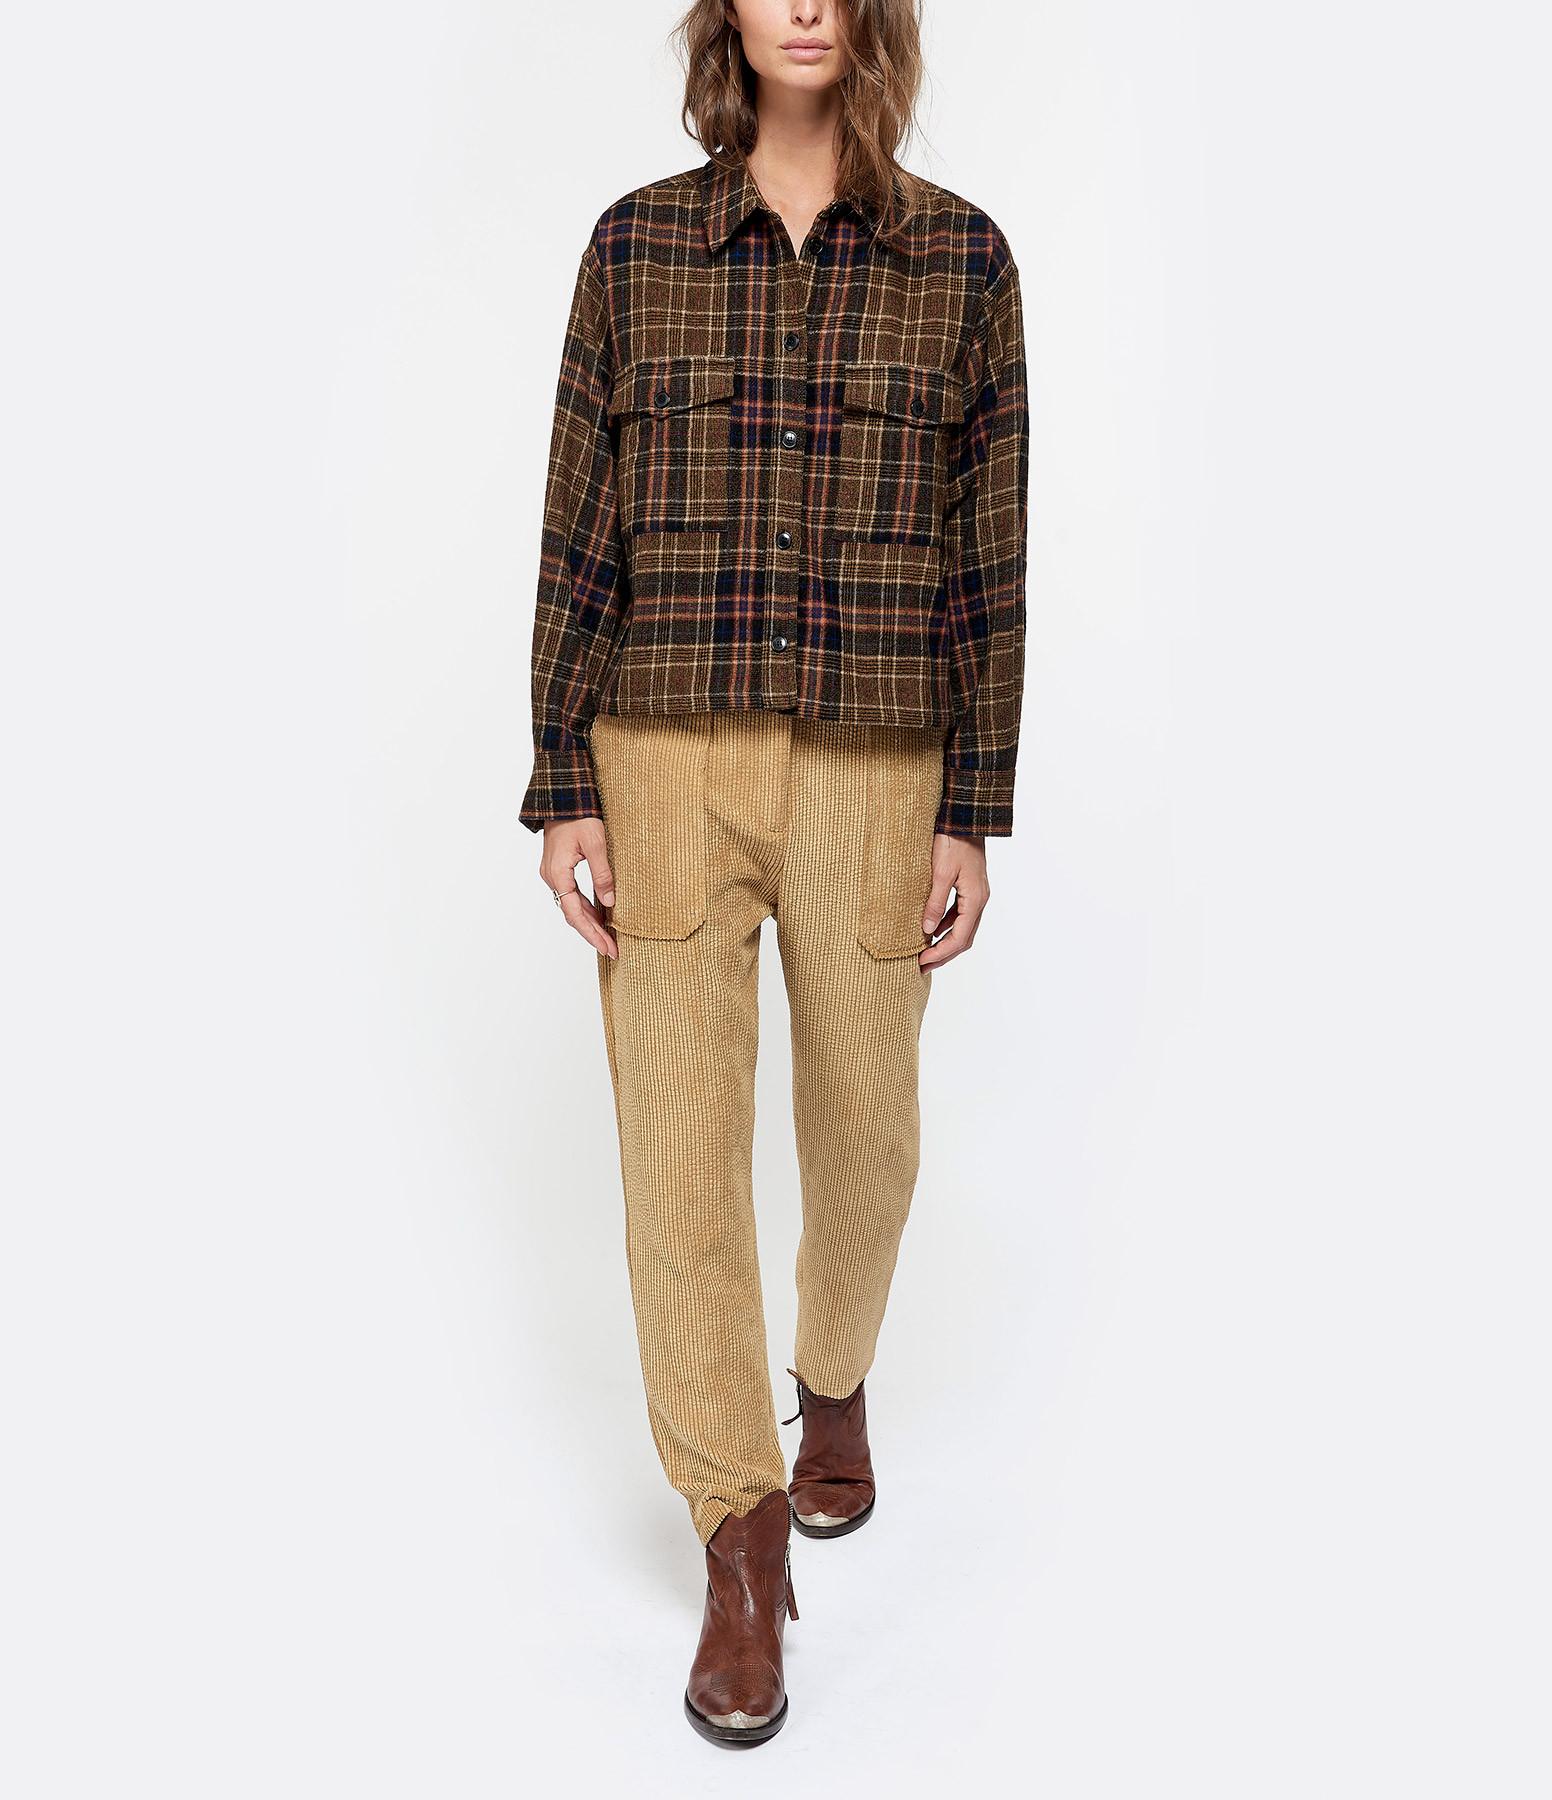 LAURENCE BRAS - Pantalon Mare Beige